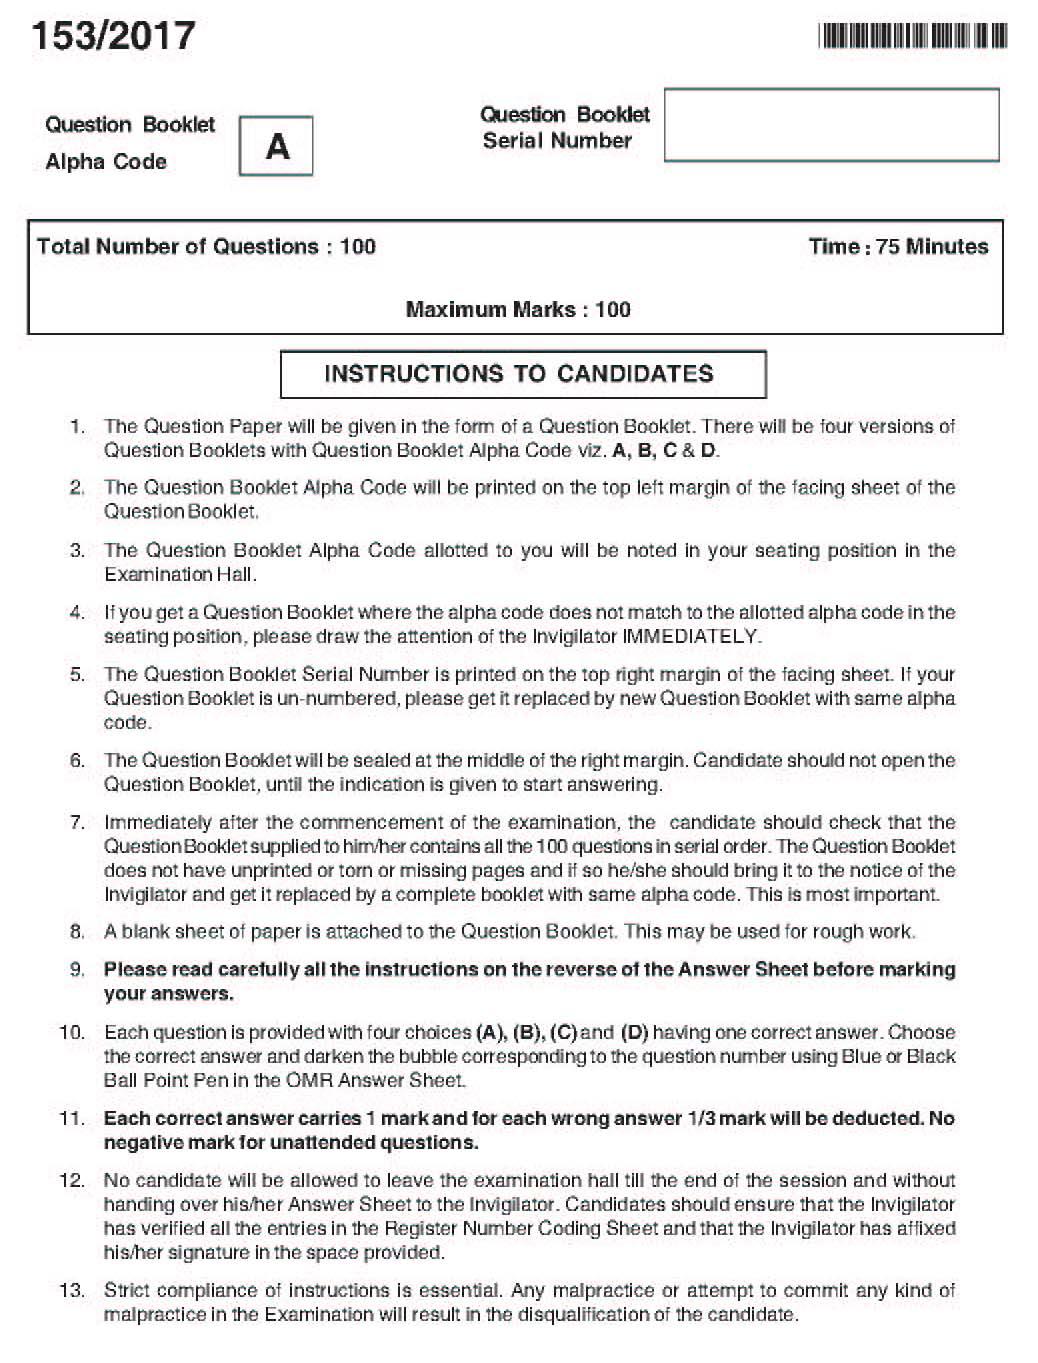 Kerala PSC Assistant Engineer Civil Exam 2017 Question Paper